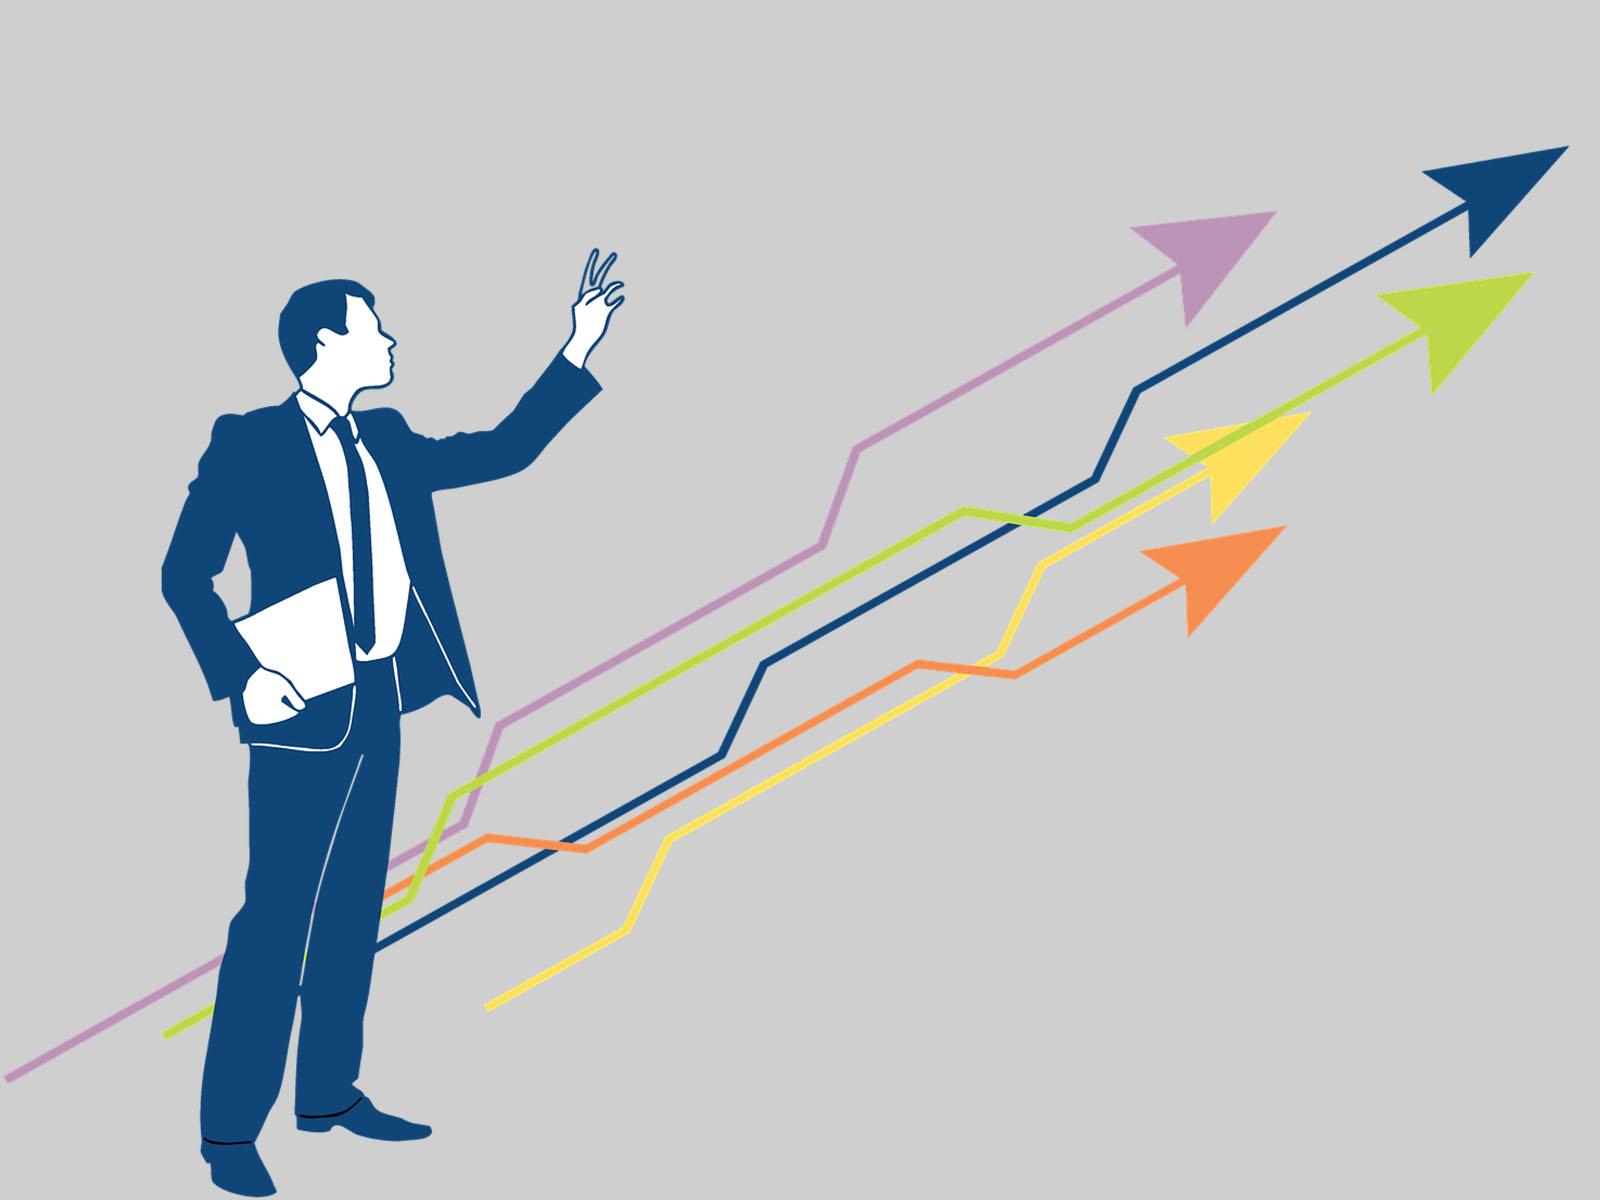 Economic Improvement Backgrounds for Powerpoint Templates ...